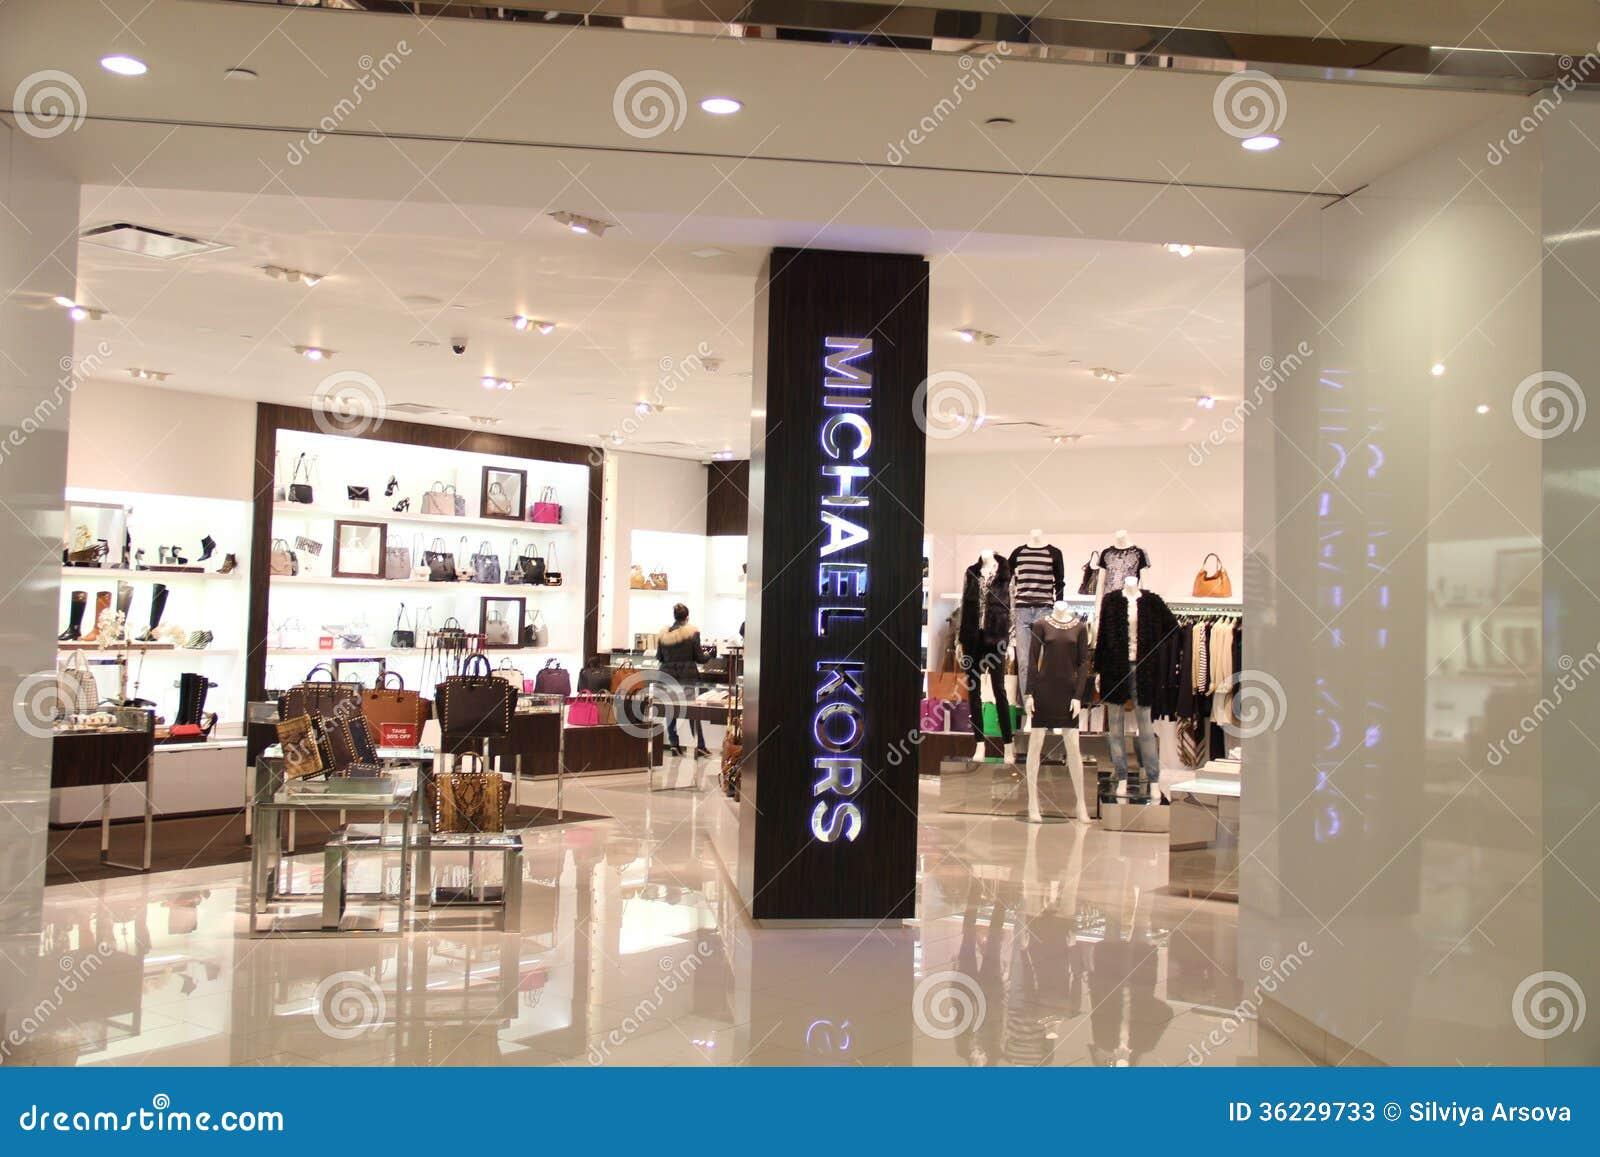 michael kors fashion store editorial stock photo image 36229733. Black Bedroom Furniture Sets. Home Design Ideas